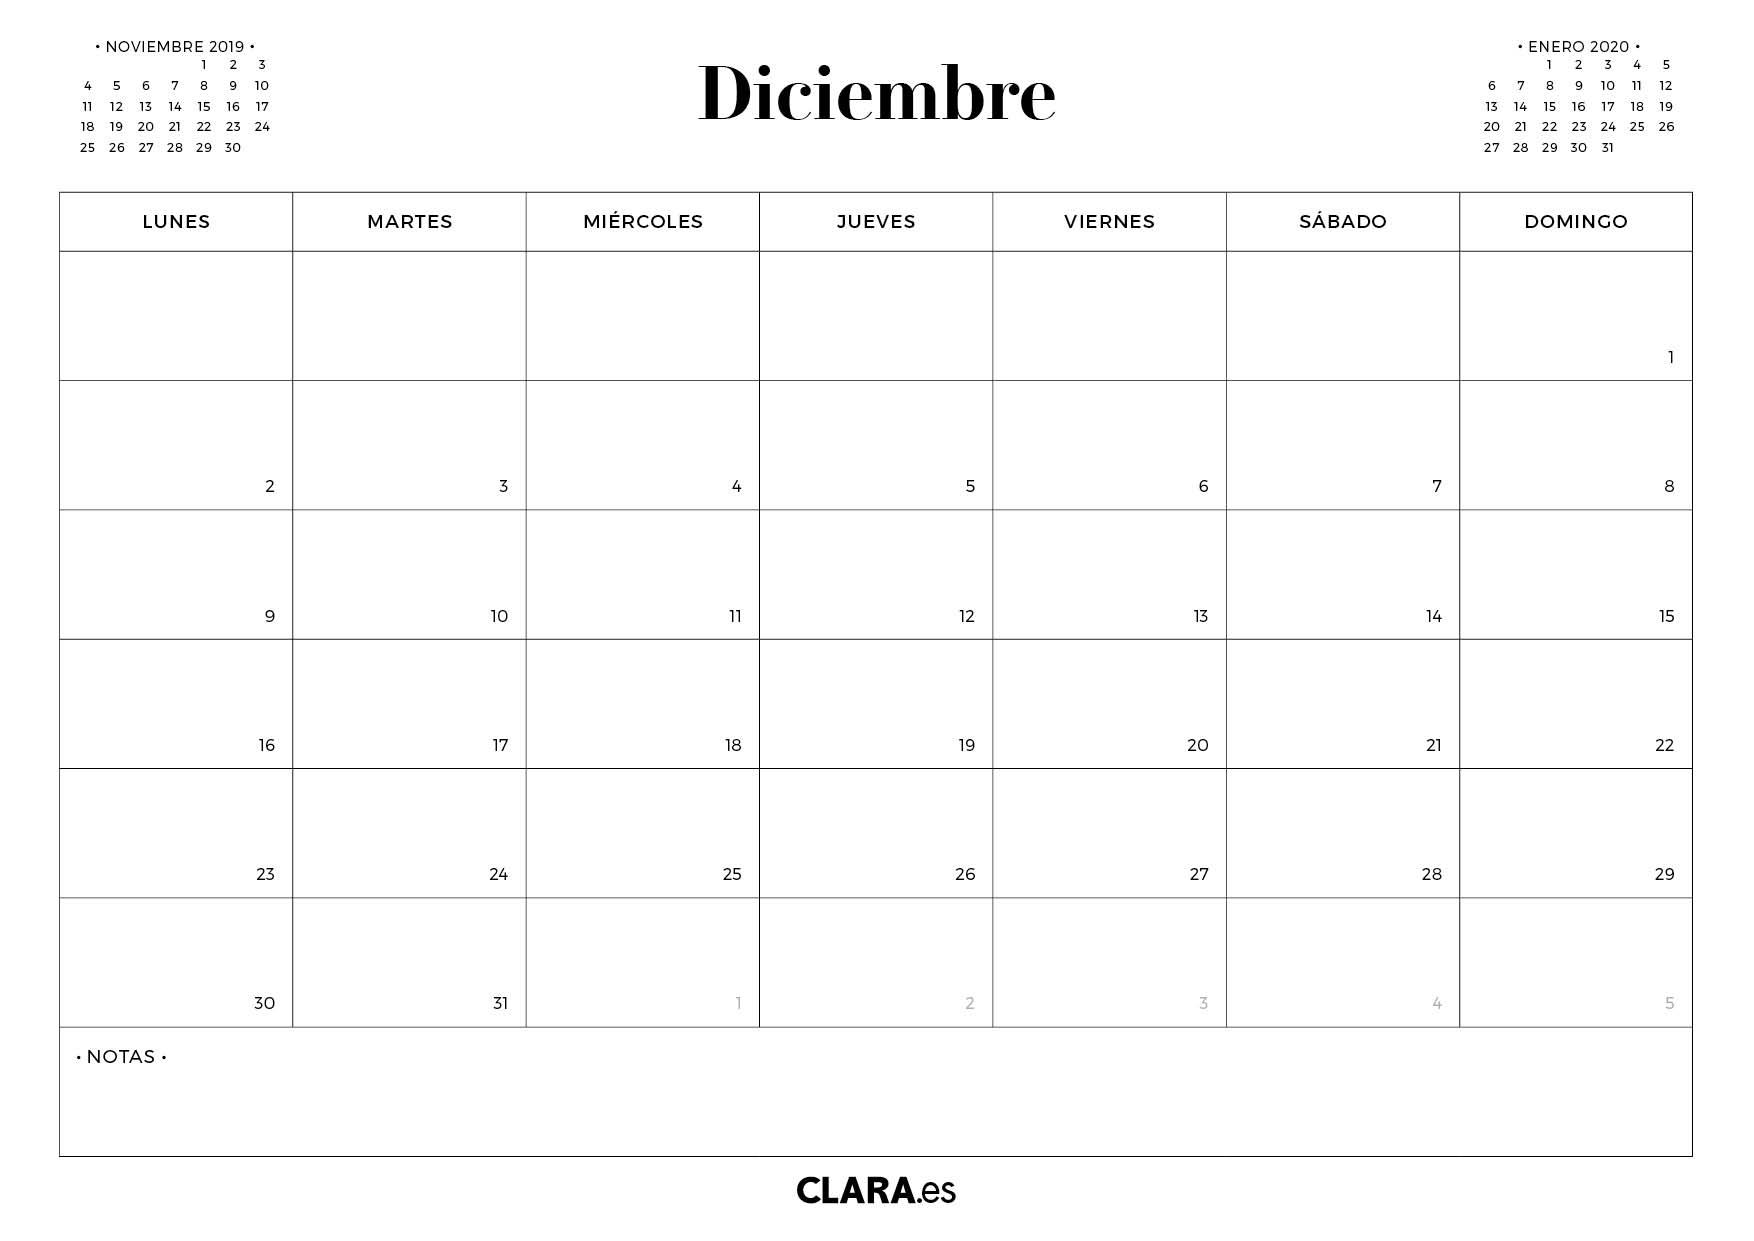 Calendario 2020 Gratis Con Foto.Diciembre 2020 Images Reverse Search